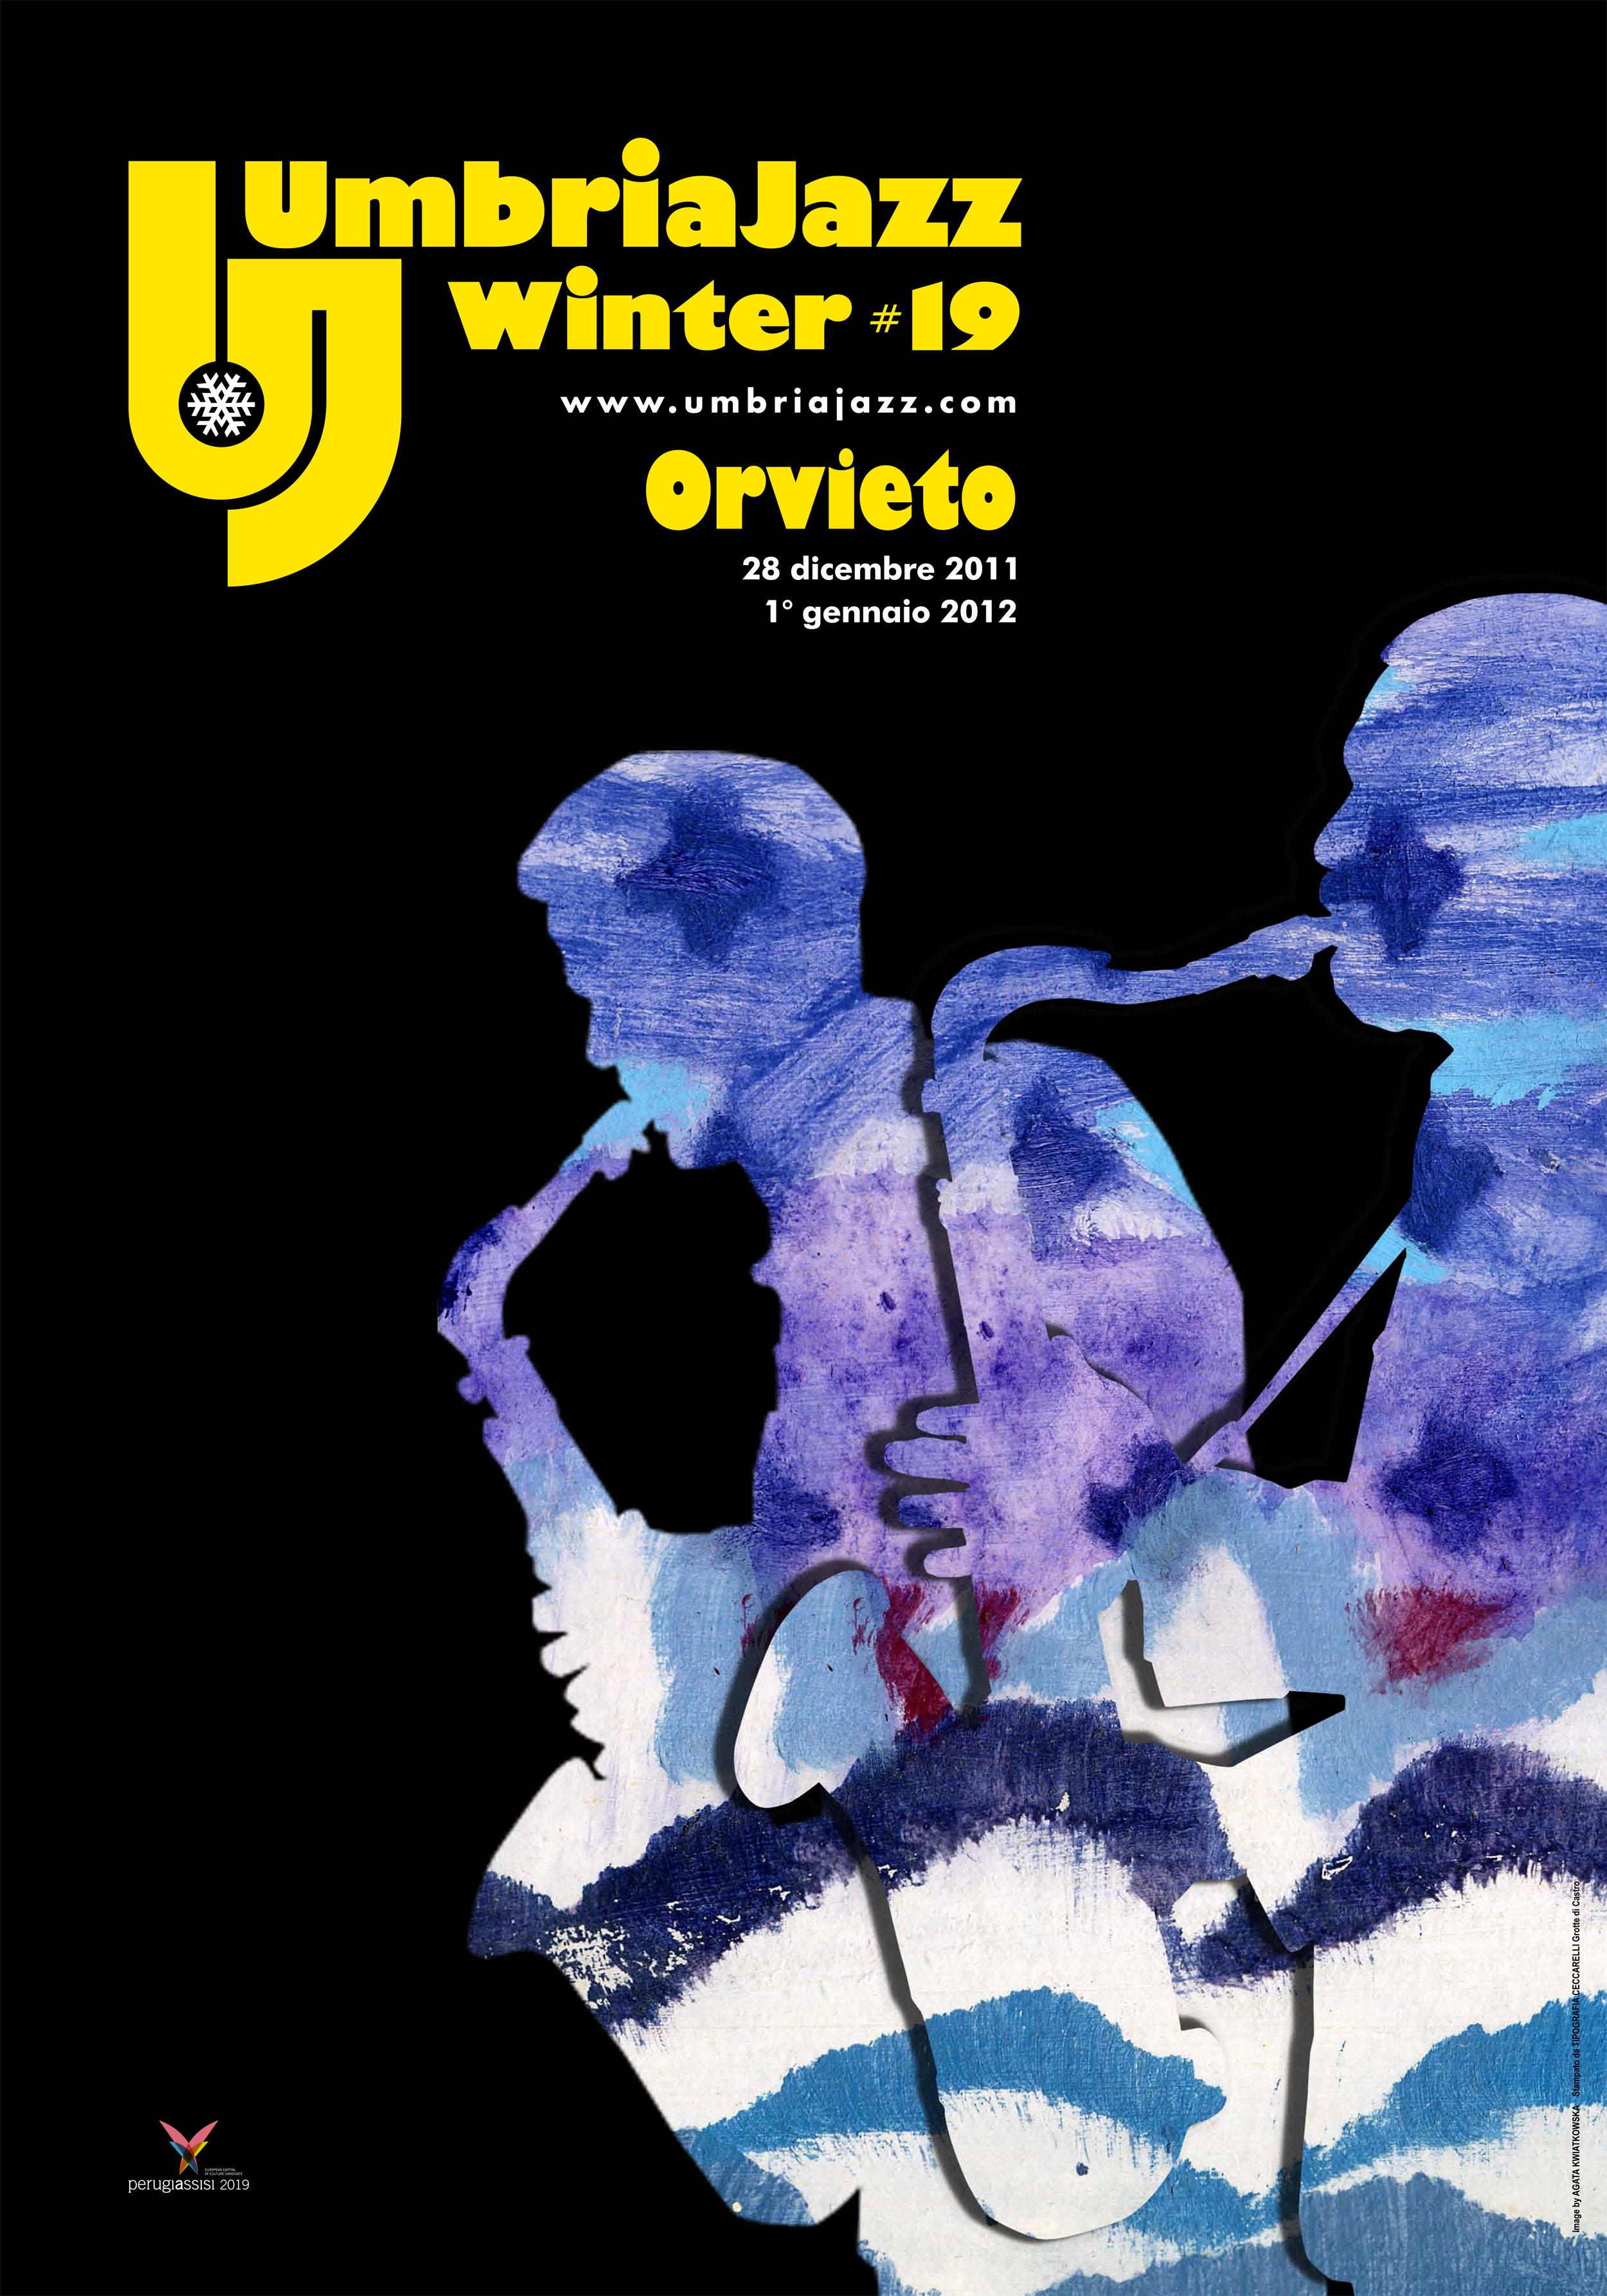 Umbria Jazz Winter 2011 (#19)